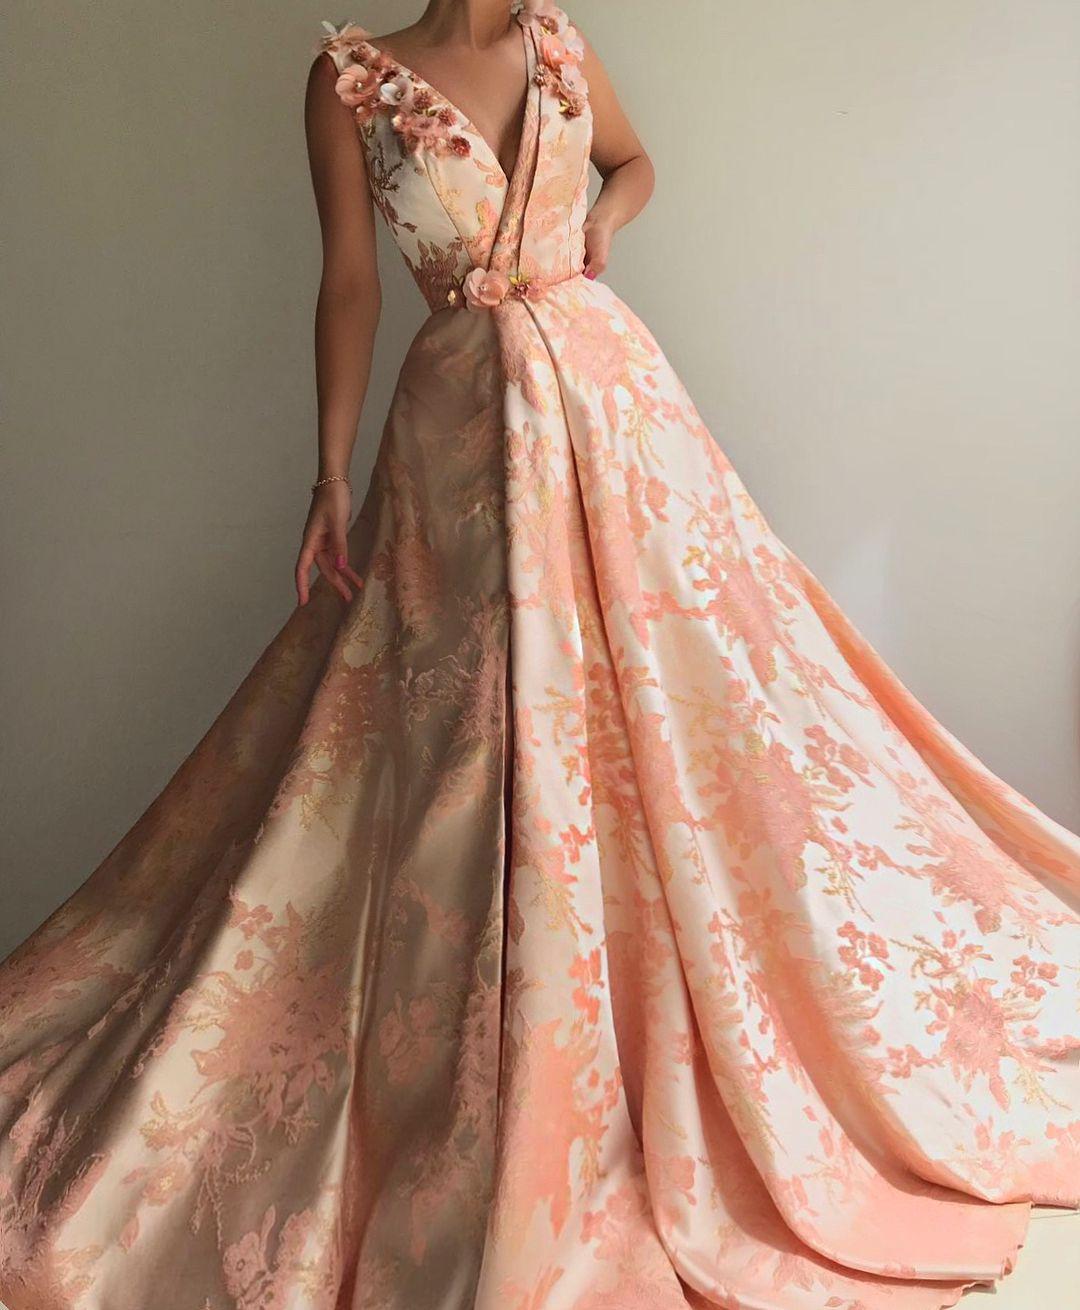 Teutamatoshiduriqi Prom Dresses Gowns Evening Gowns